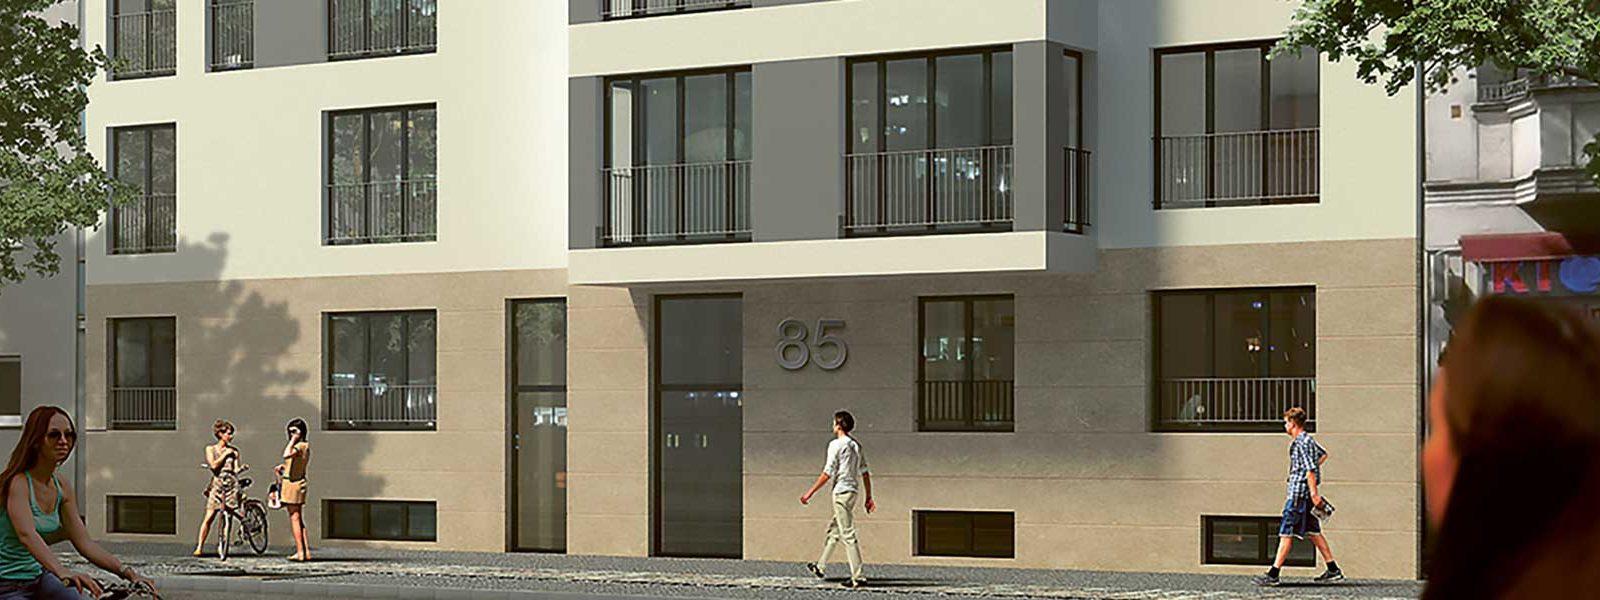 L85项目 – 柏林夏洛滕堡区新建小户型项目